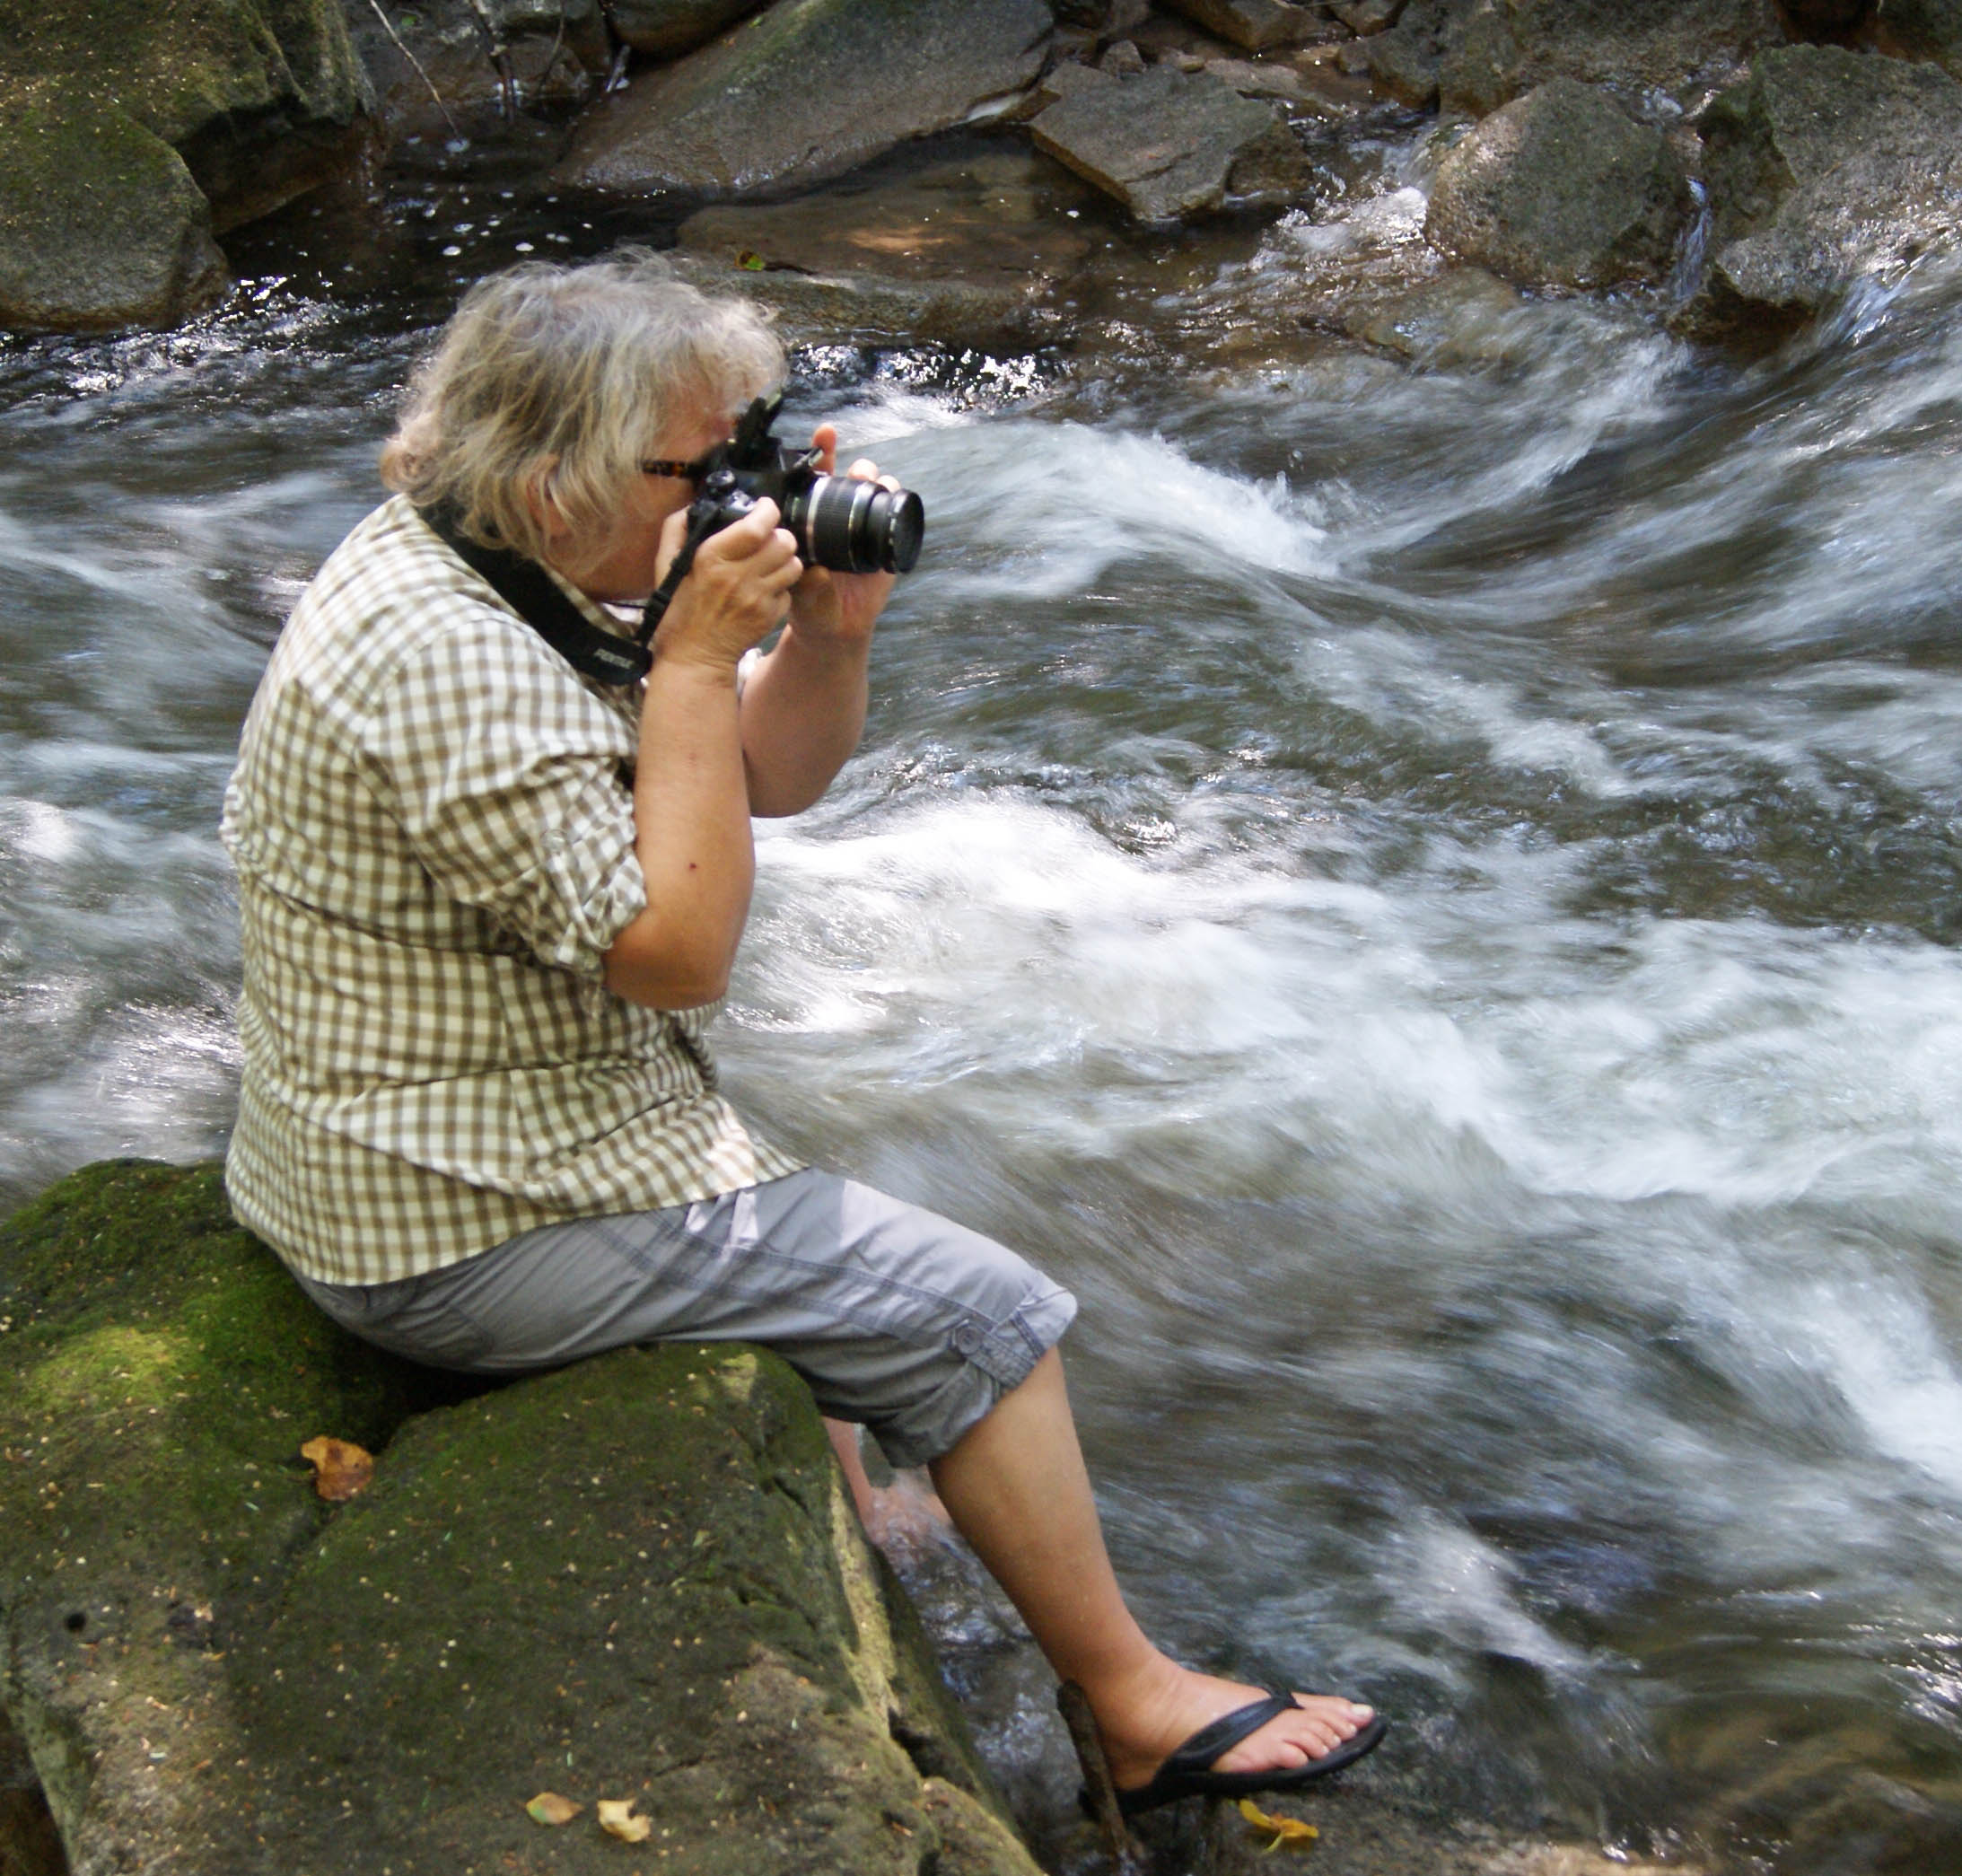 Nina Munteanu on the Credit River, near the Forks of the Credit. (Photo via Nina Munteanu)